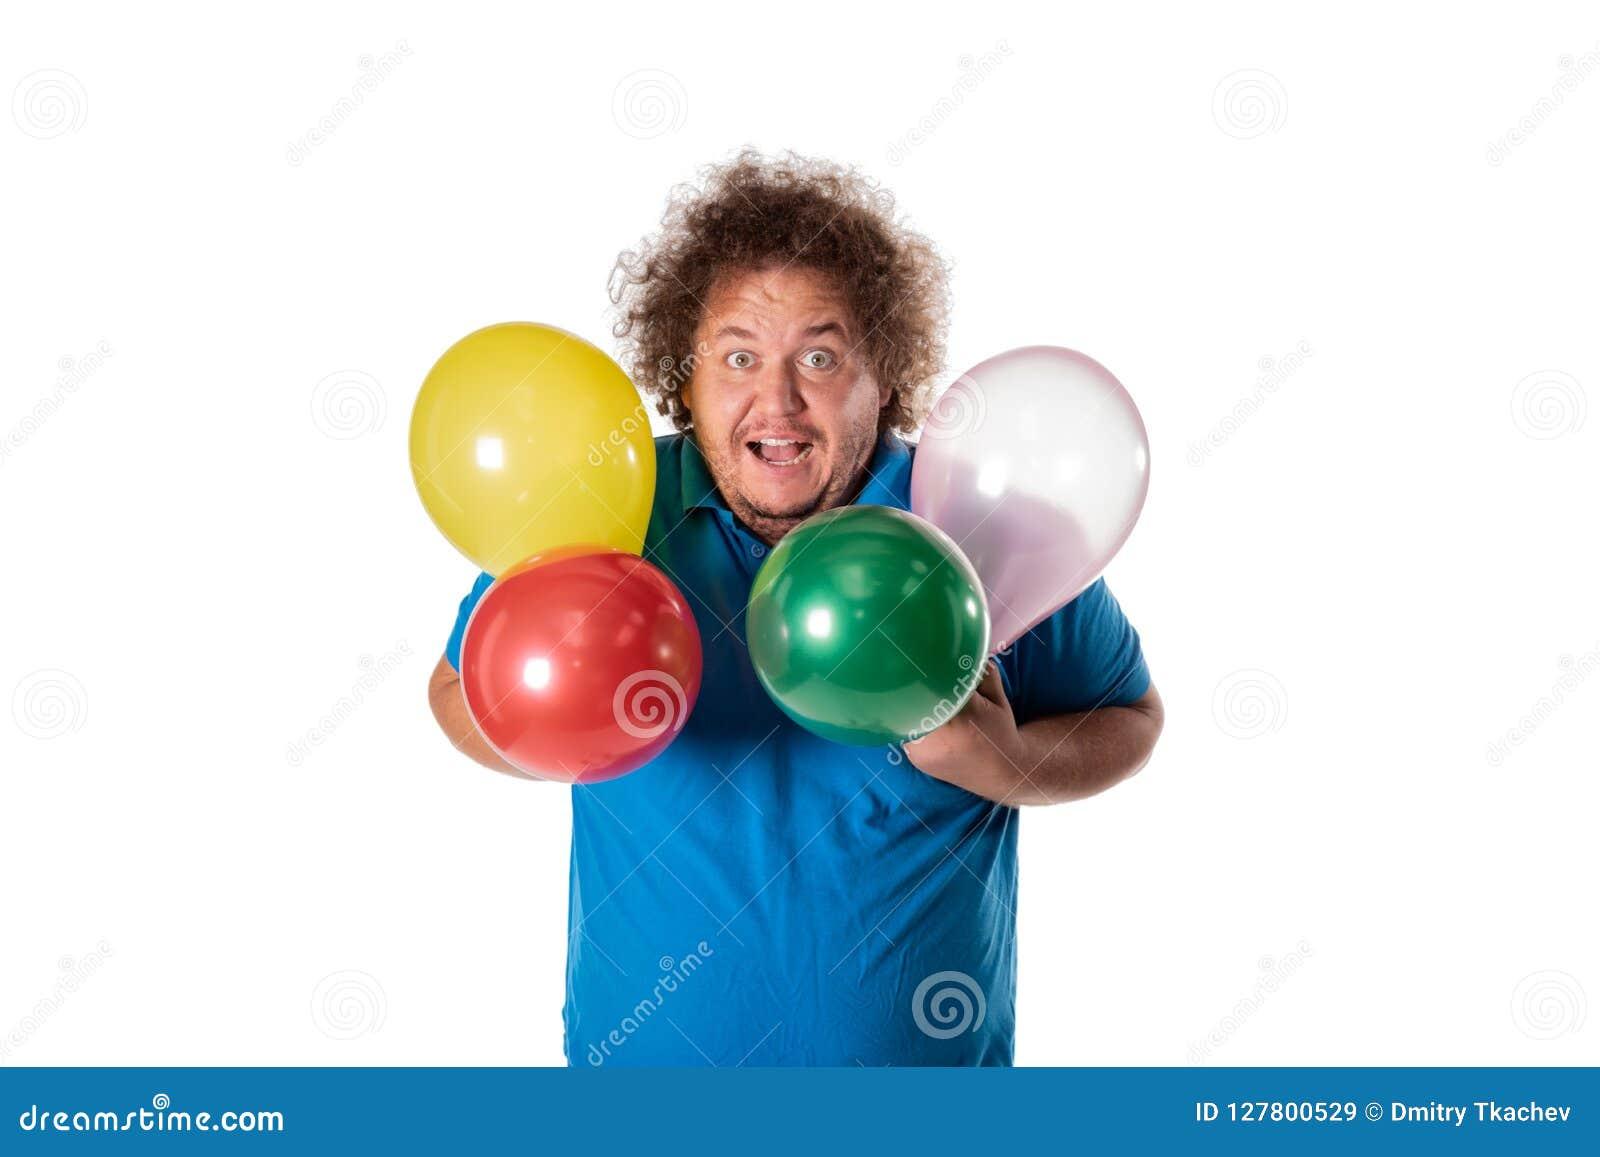 Funny fat man with balloons. Happy birthday